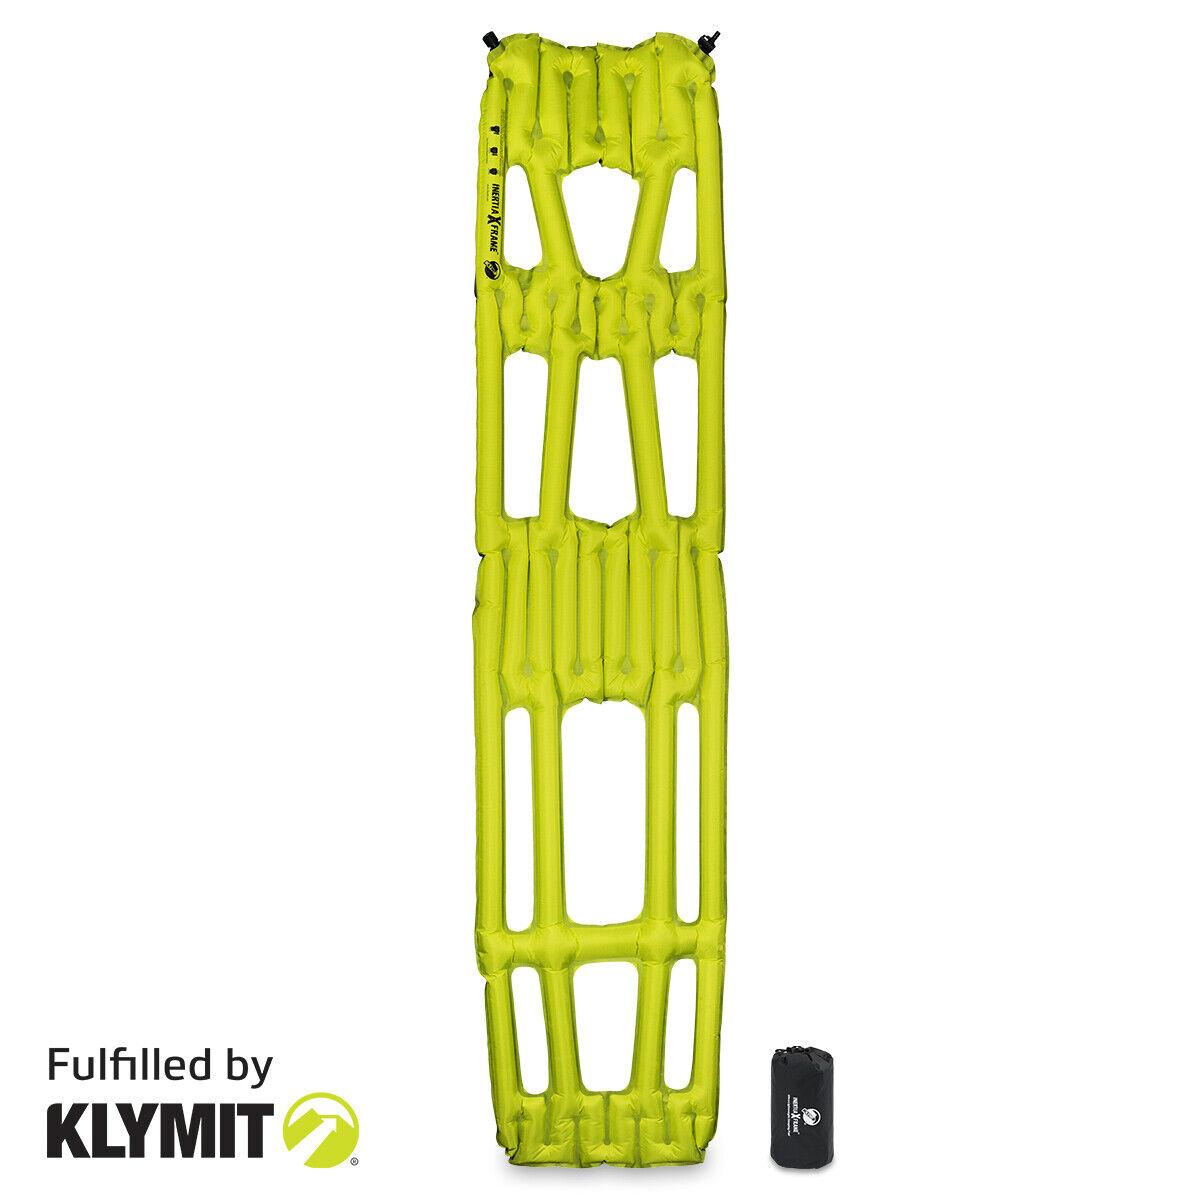 KLYMIT Inertia X Frame Ultra-Light Sleeping Camping Pad - Certified Refurbished